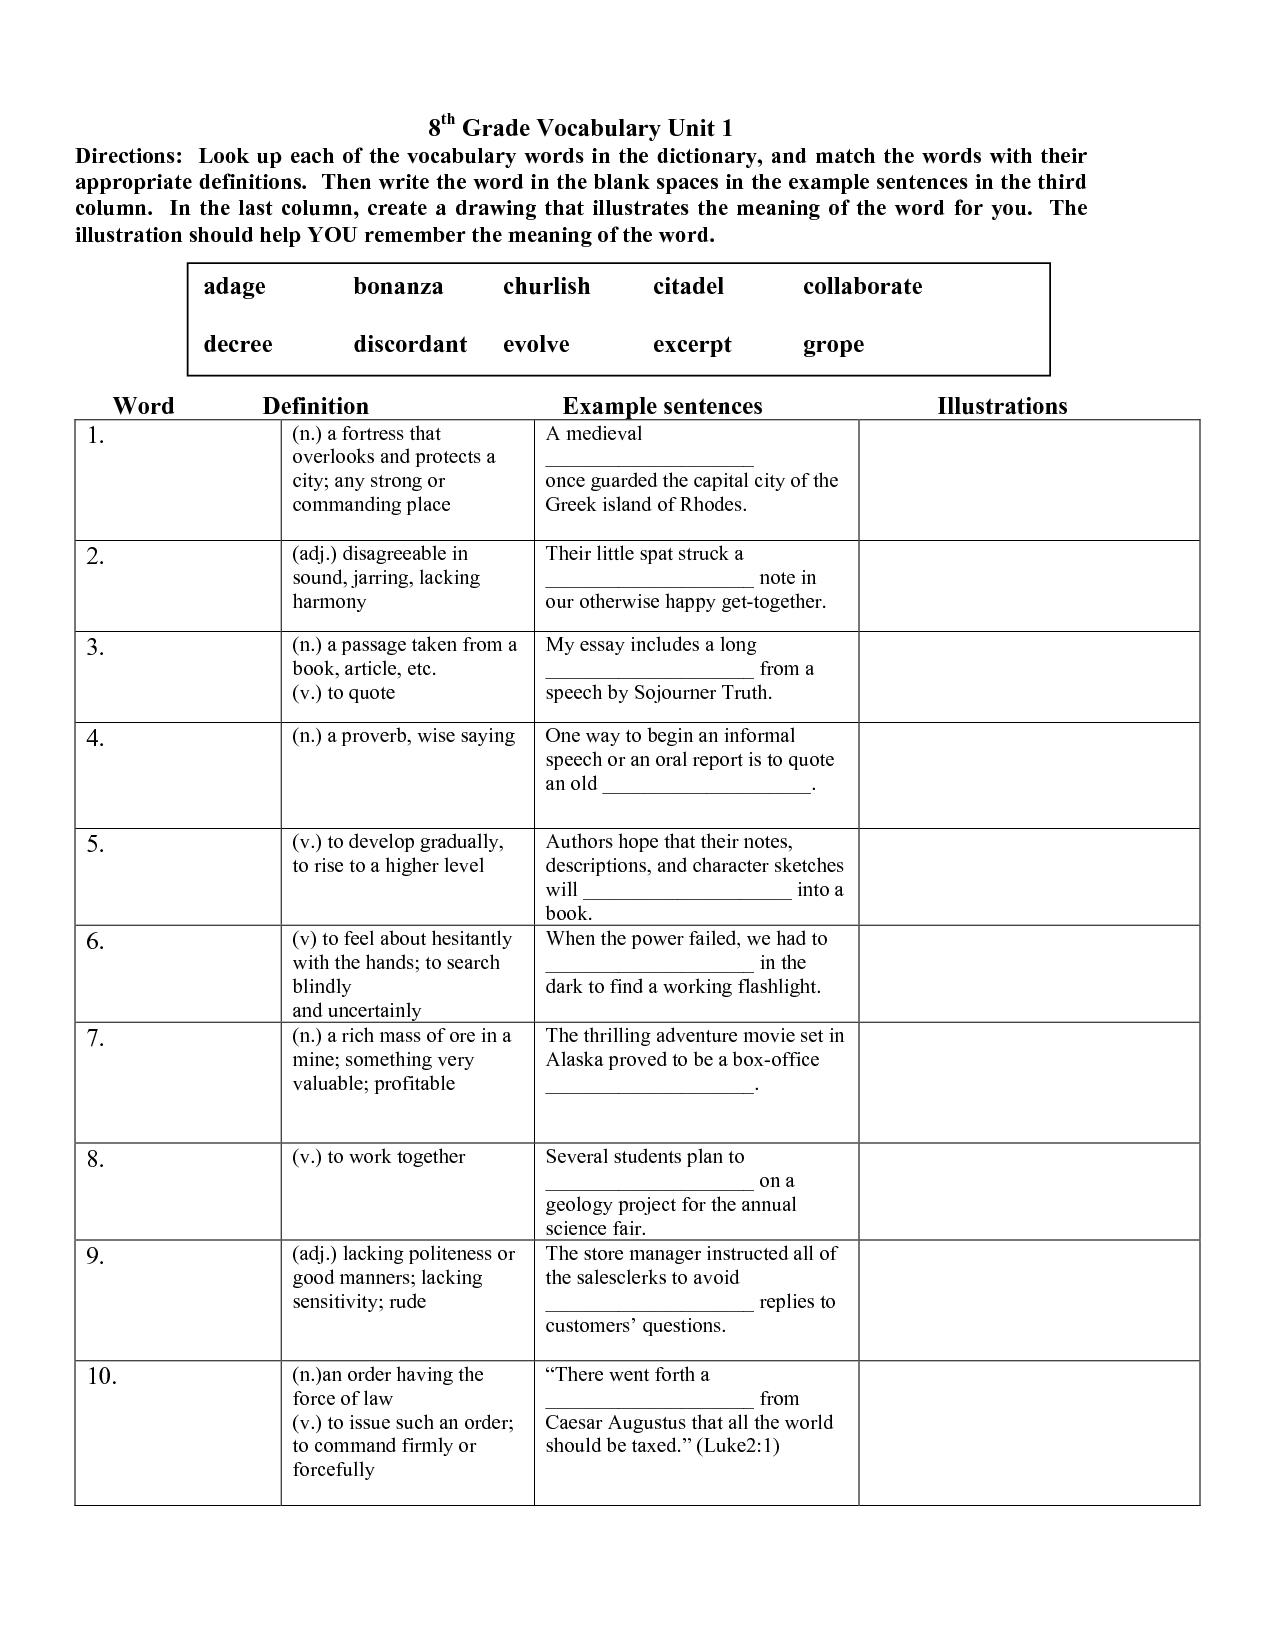 Math Vocabulary Worksheet Printable Worksheets Free 8th Grade